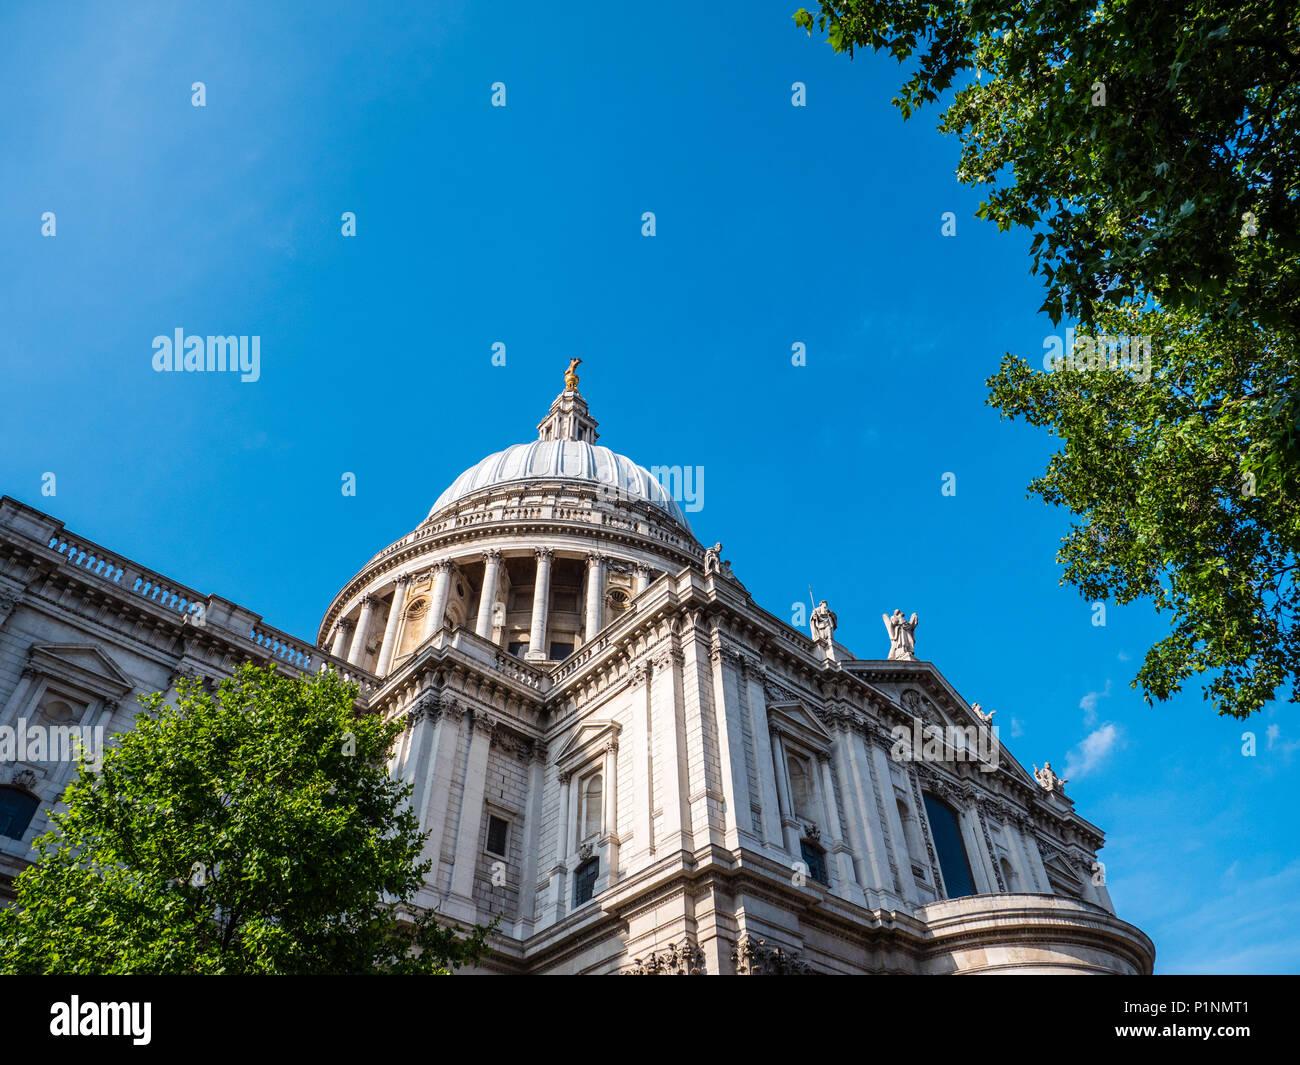 St Pauls Cathedral, City of London, London, England, UK, GB. Stock Photo